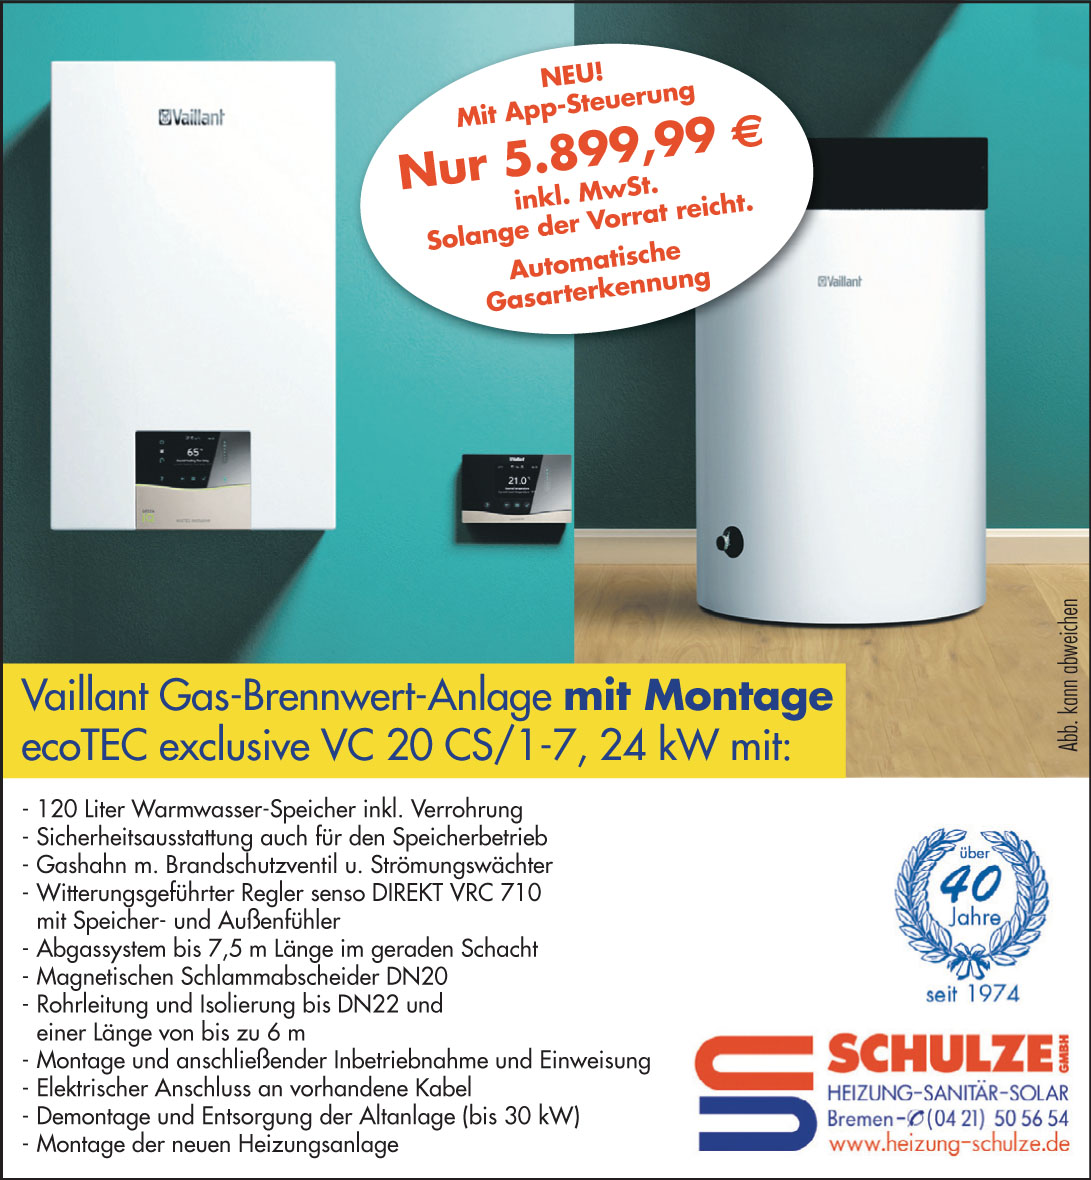 Schulze GmbH